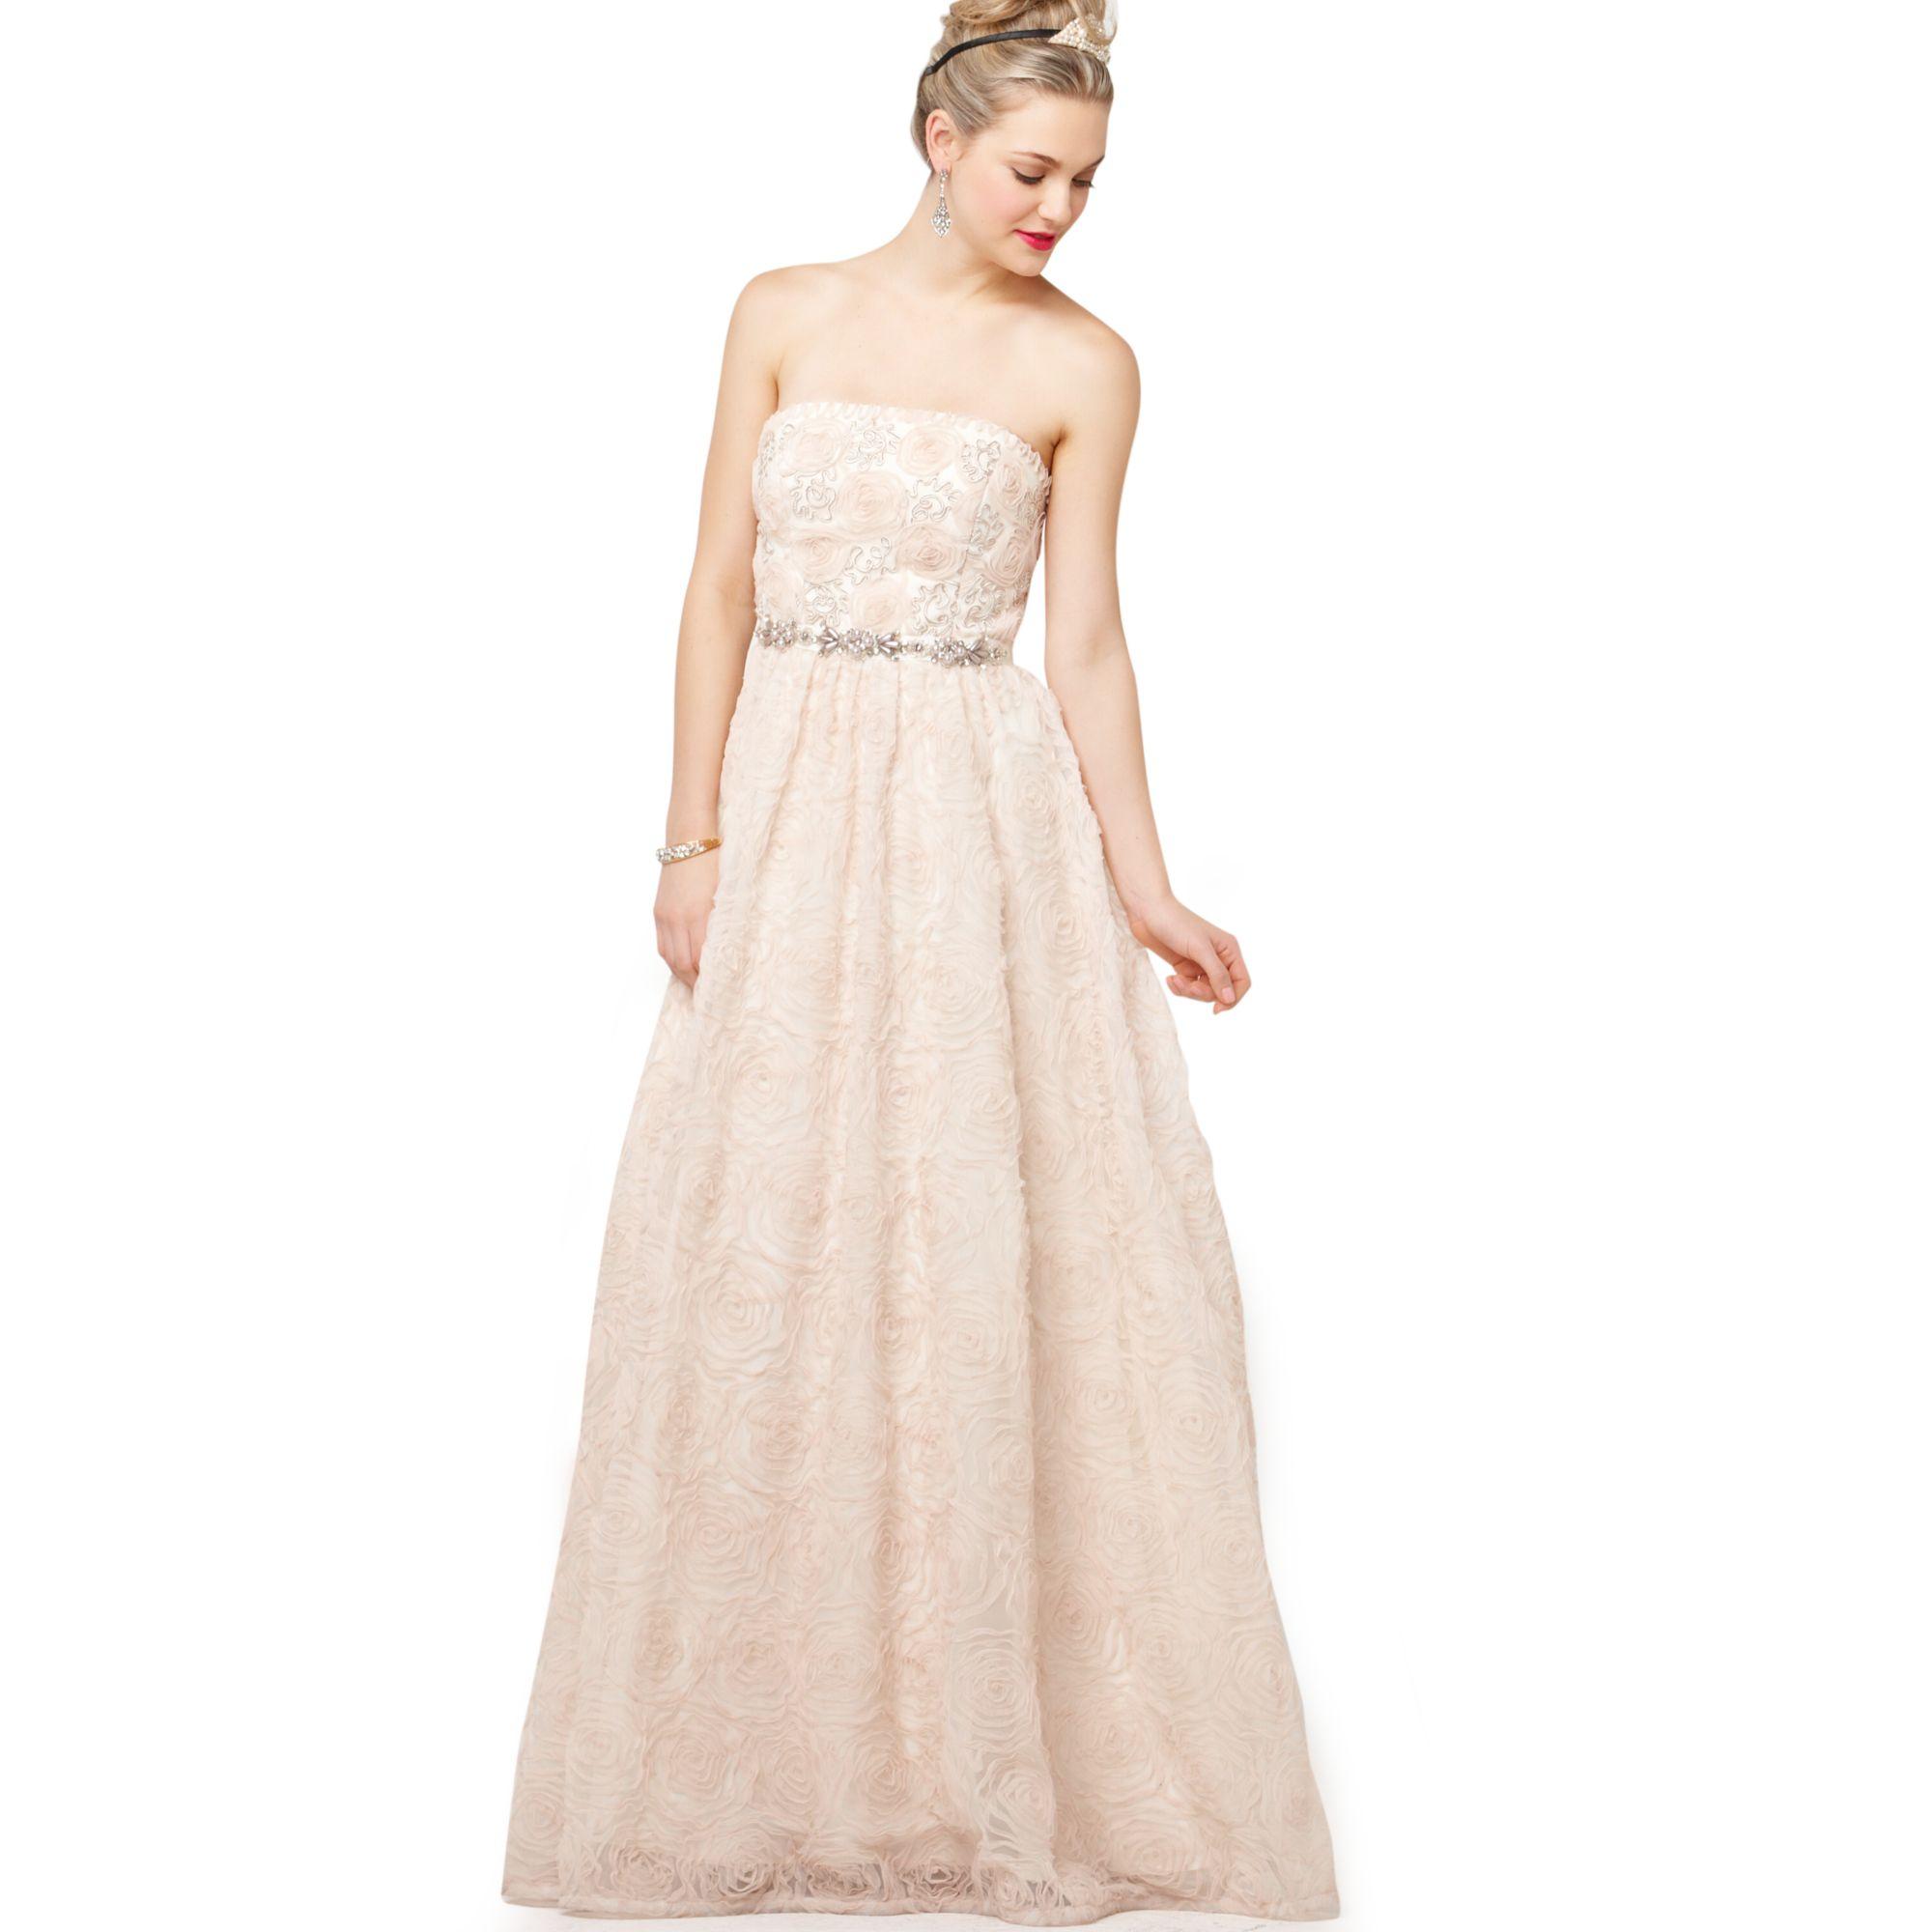 Blush Wedding Dress Petite : Strapless beaded ball gown product normal eg